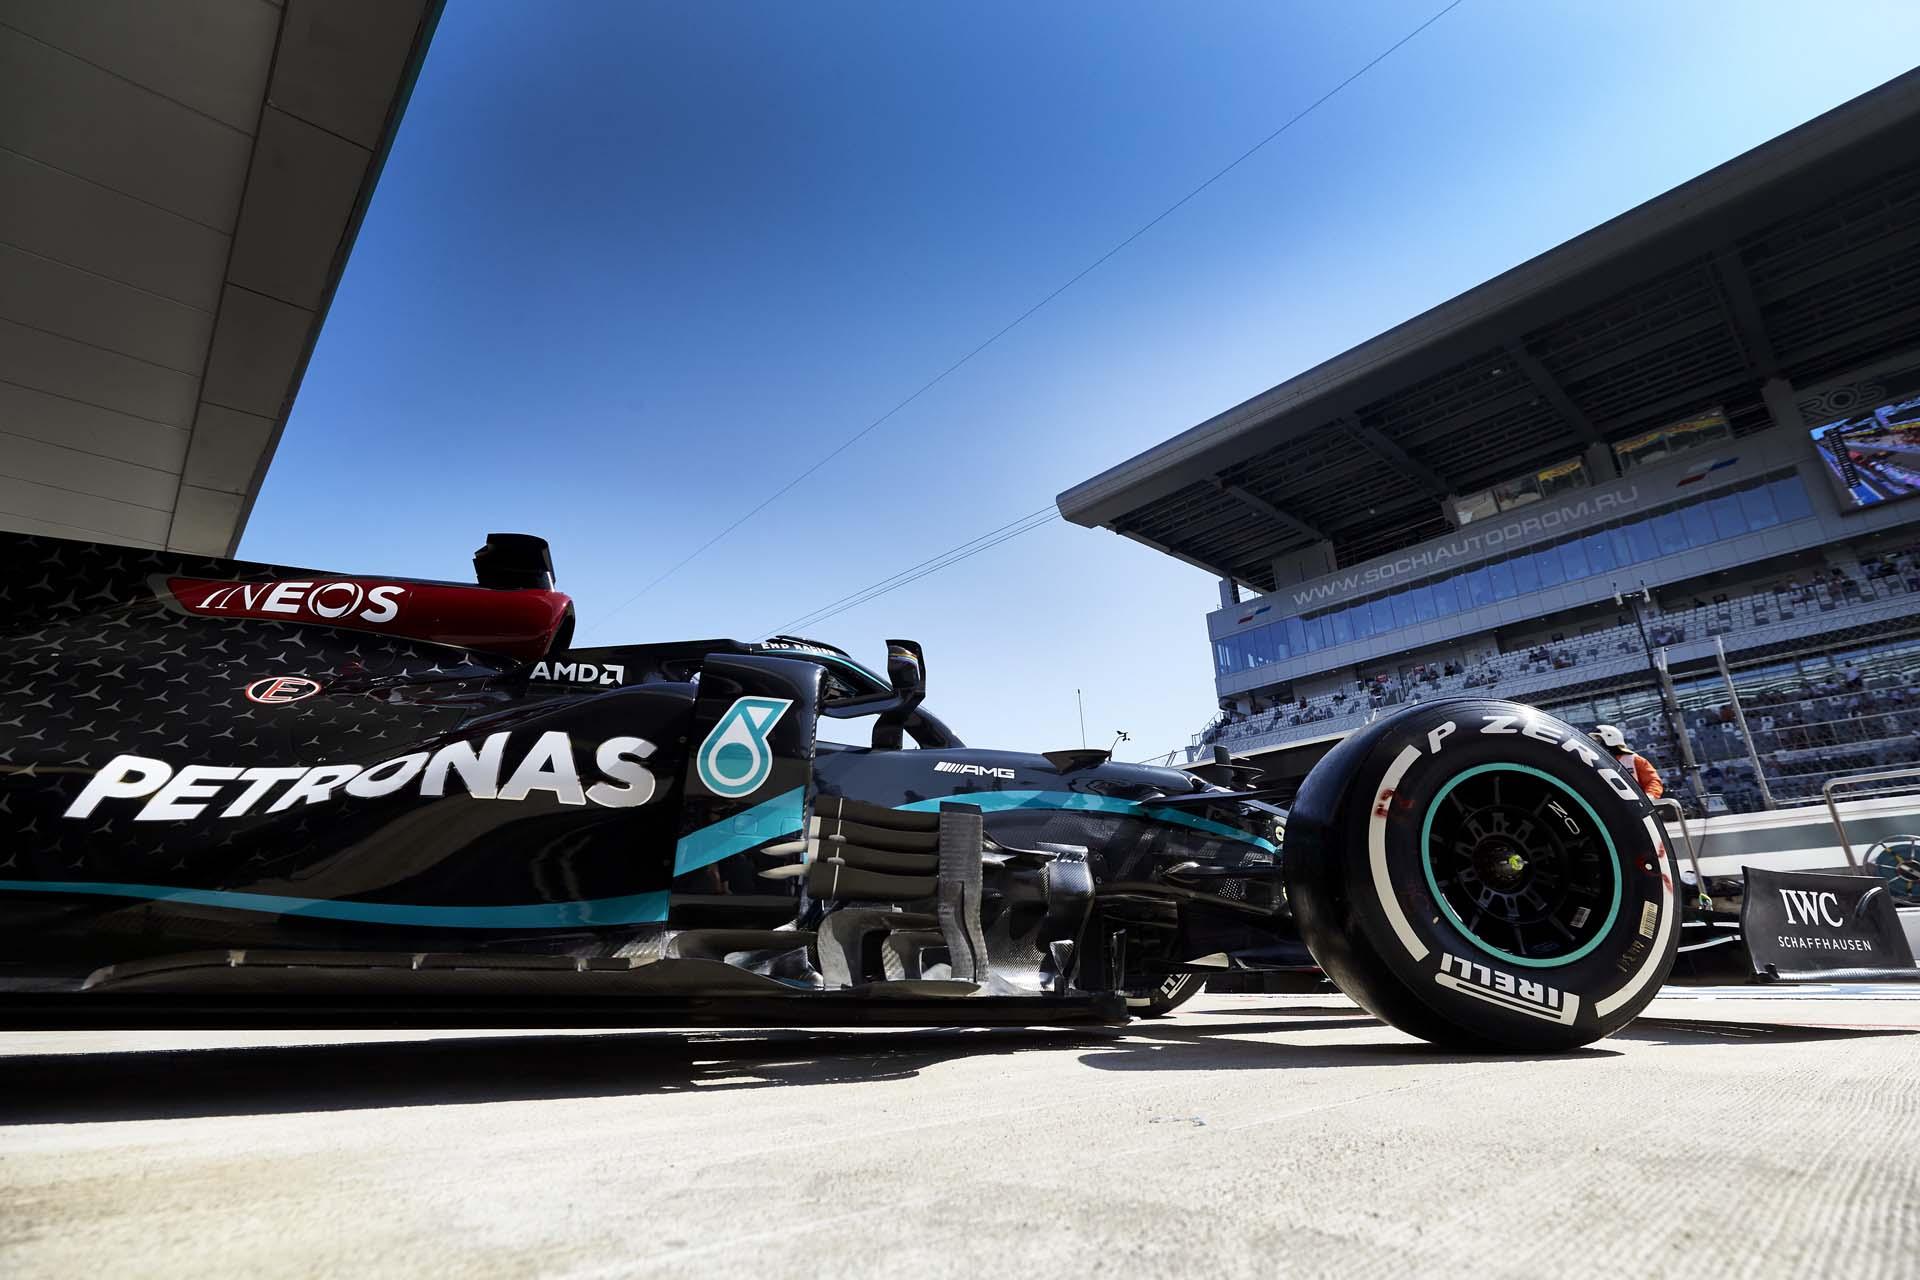 2020 Russian Grand Prix, Friday - Steve Etherington